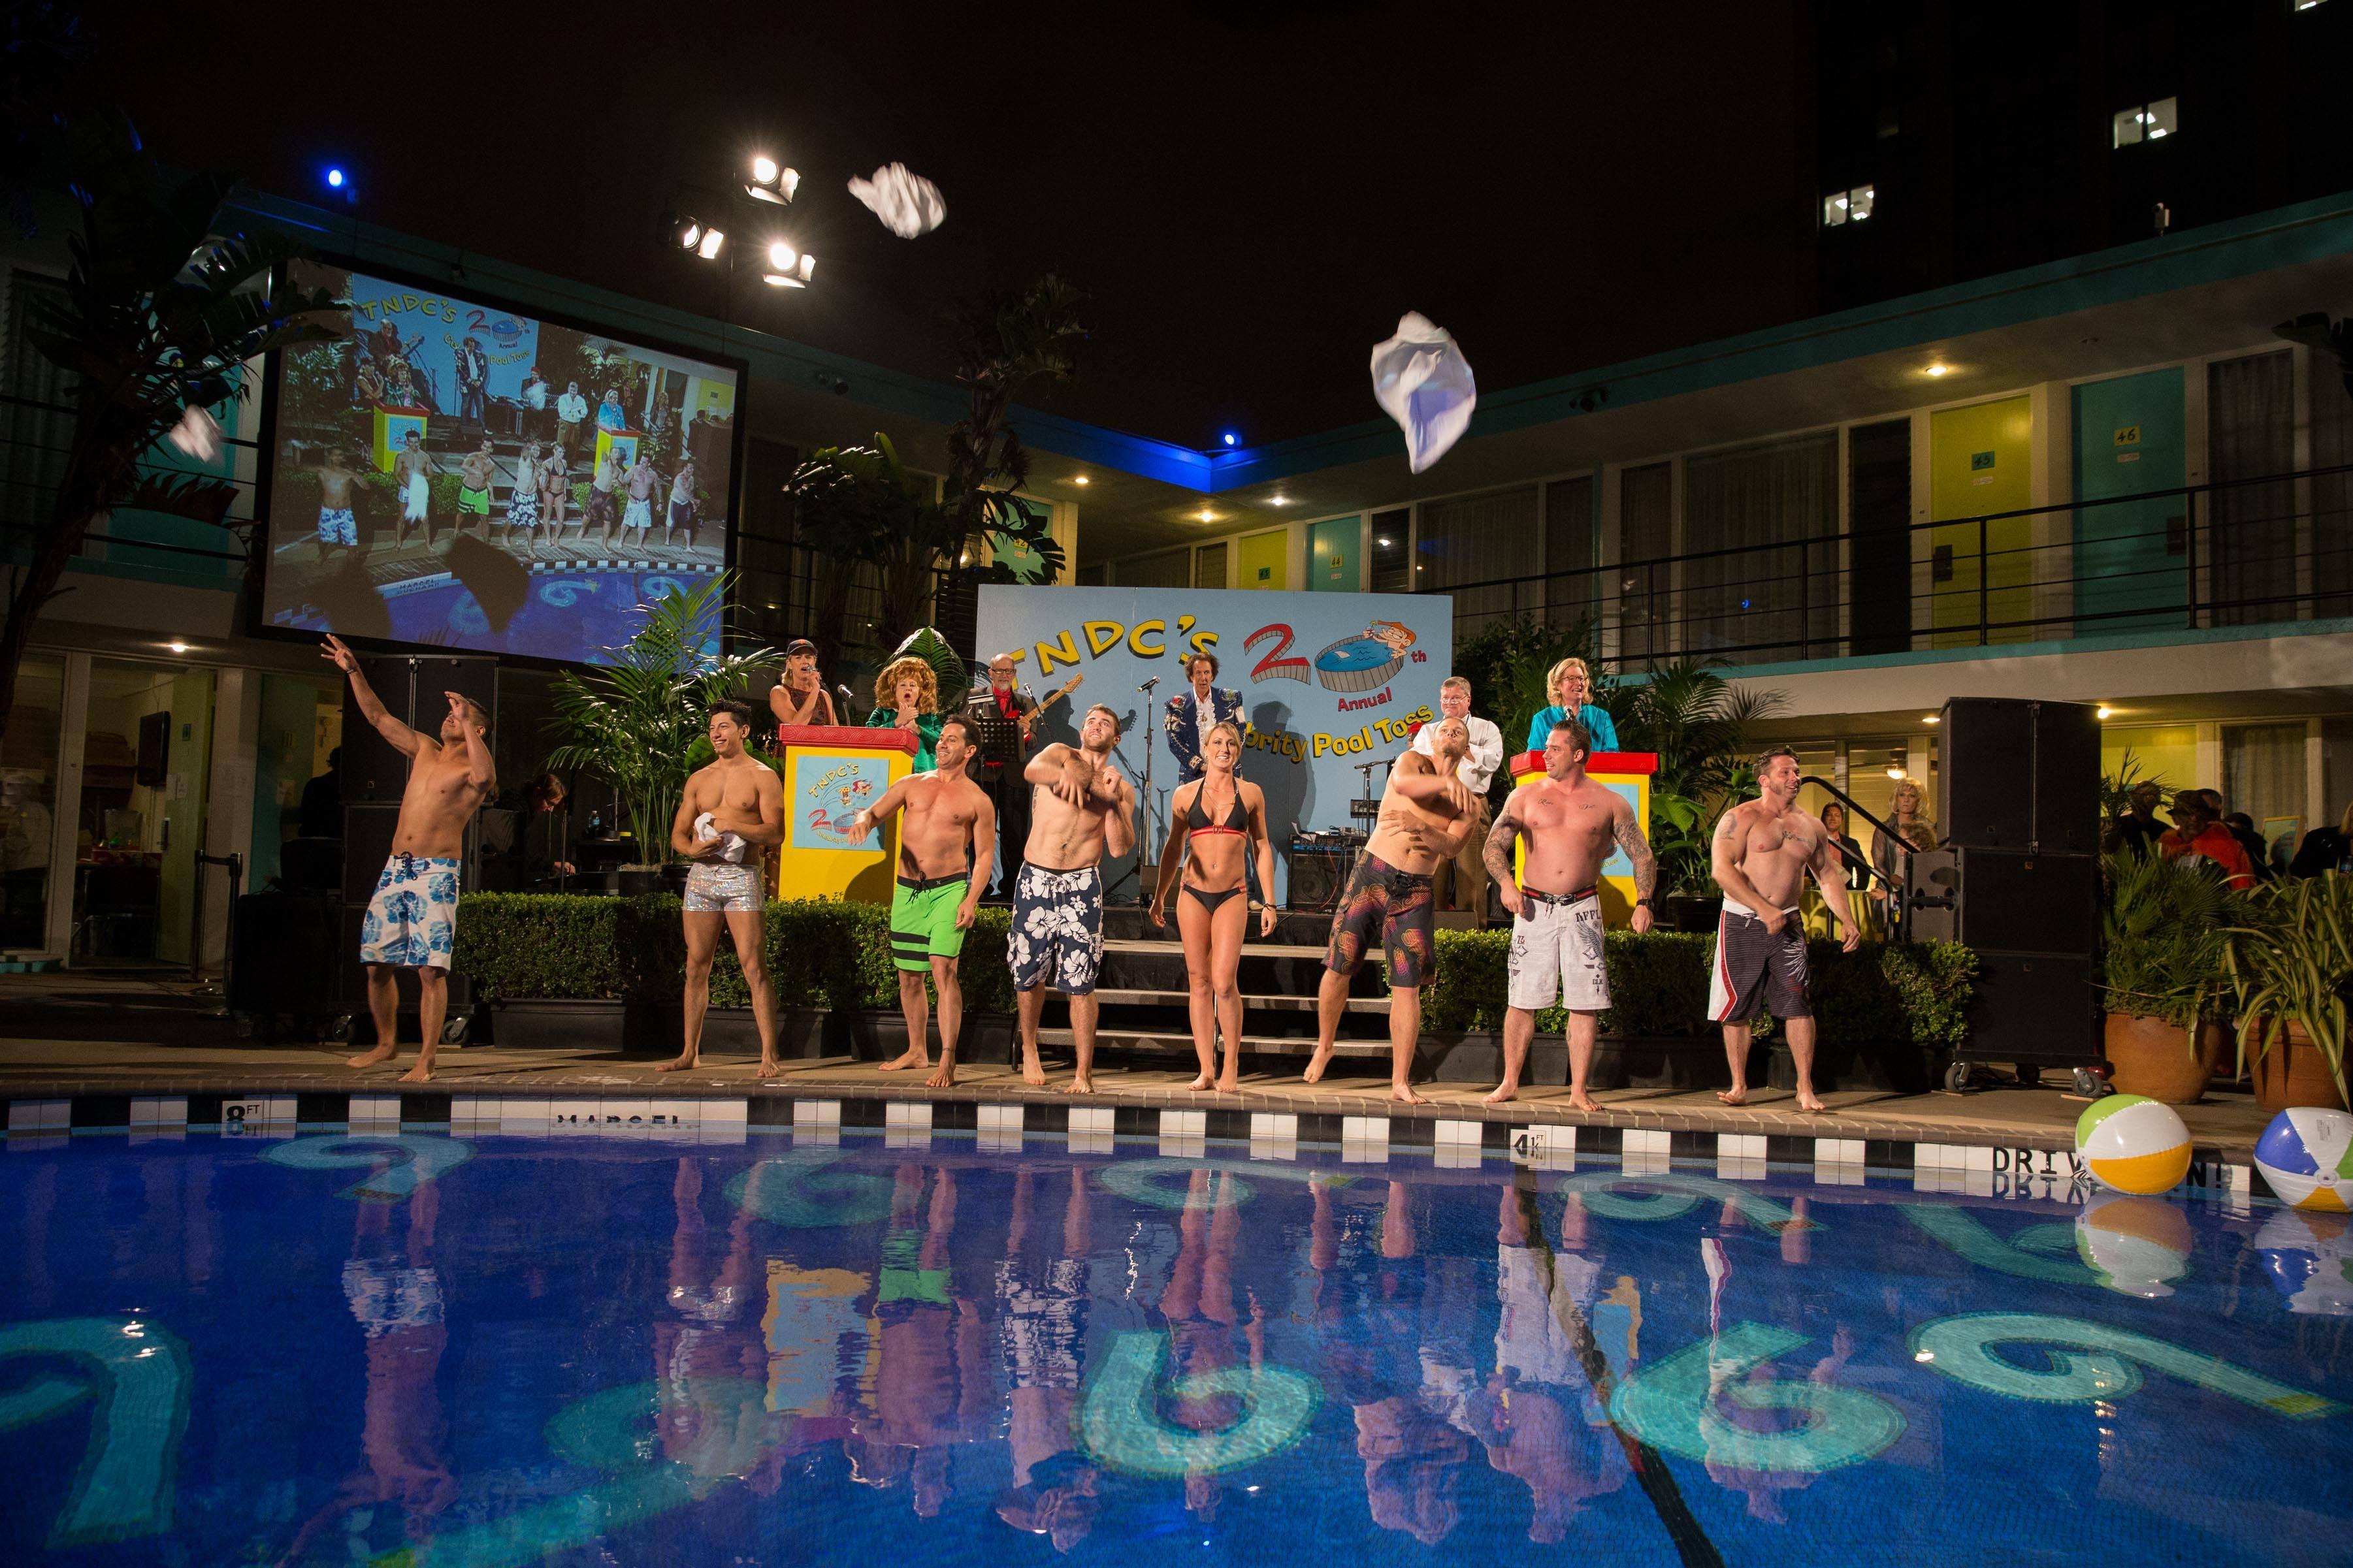 TNDC's 20th Annual Celebrity Pool Toss